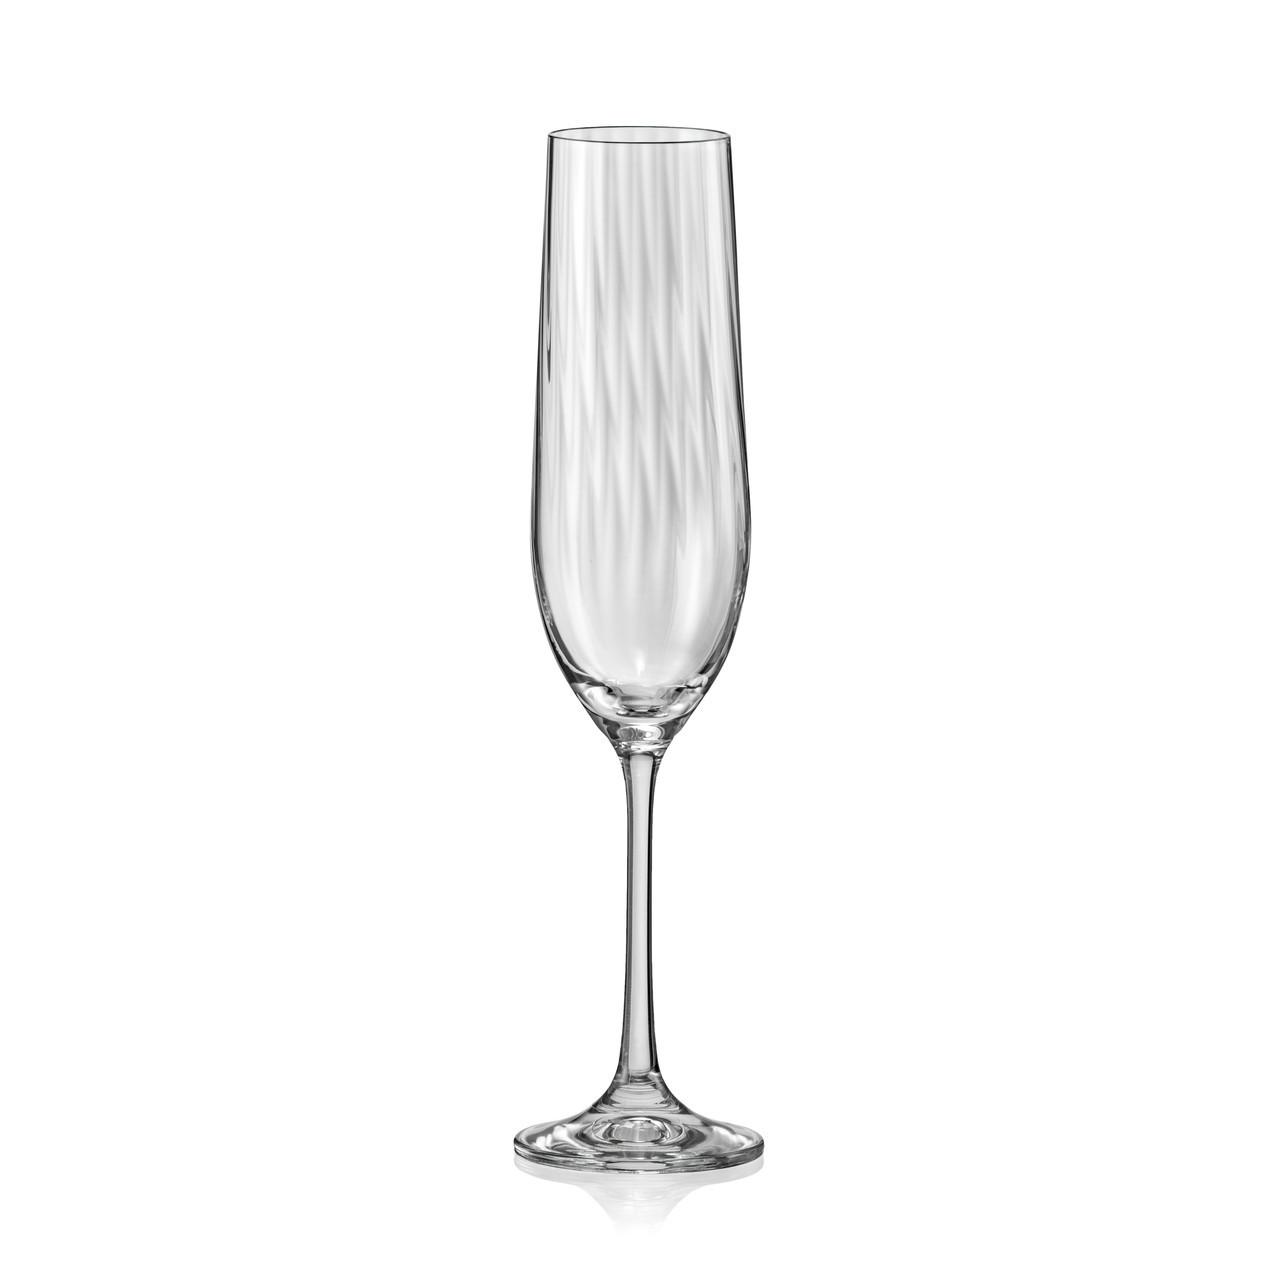 Набор бокалов для шампанского Bohemia Waterfall 6 штук 190мл богемское стекло (40729/OPT22/190)